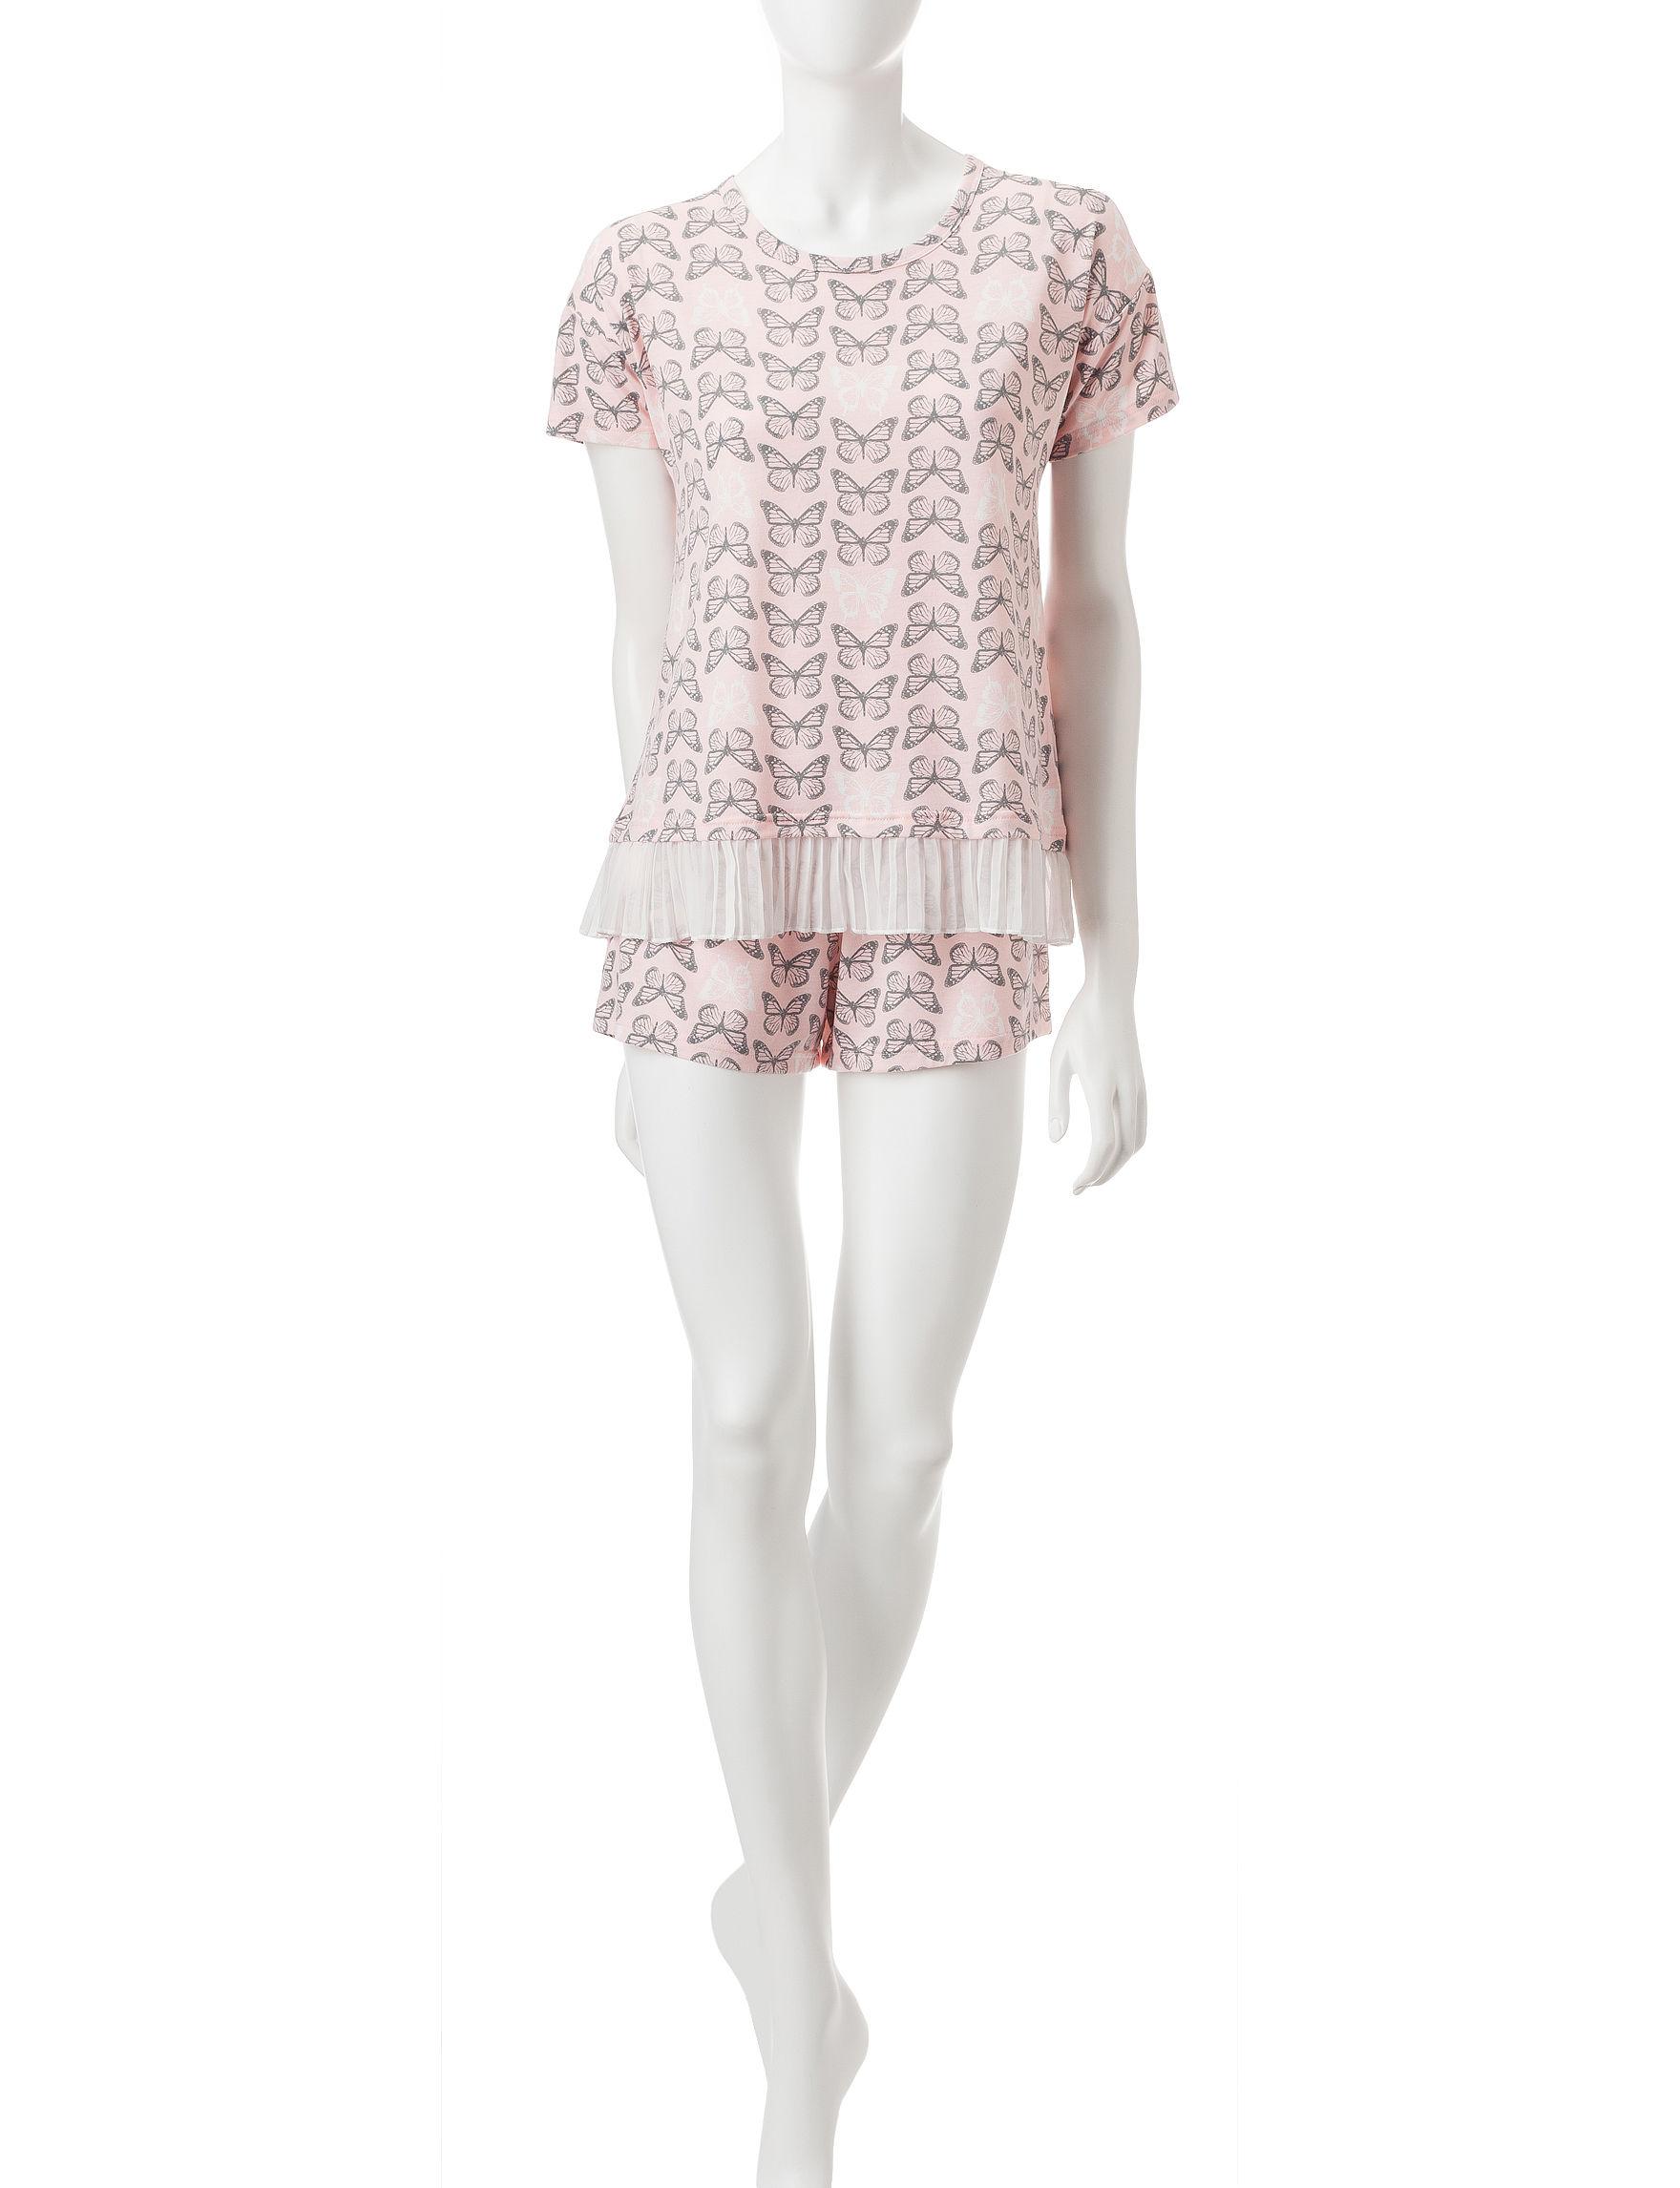 PJ Couture Pink Pajama Sets